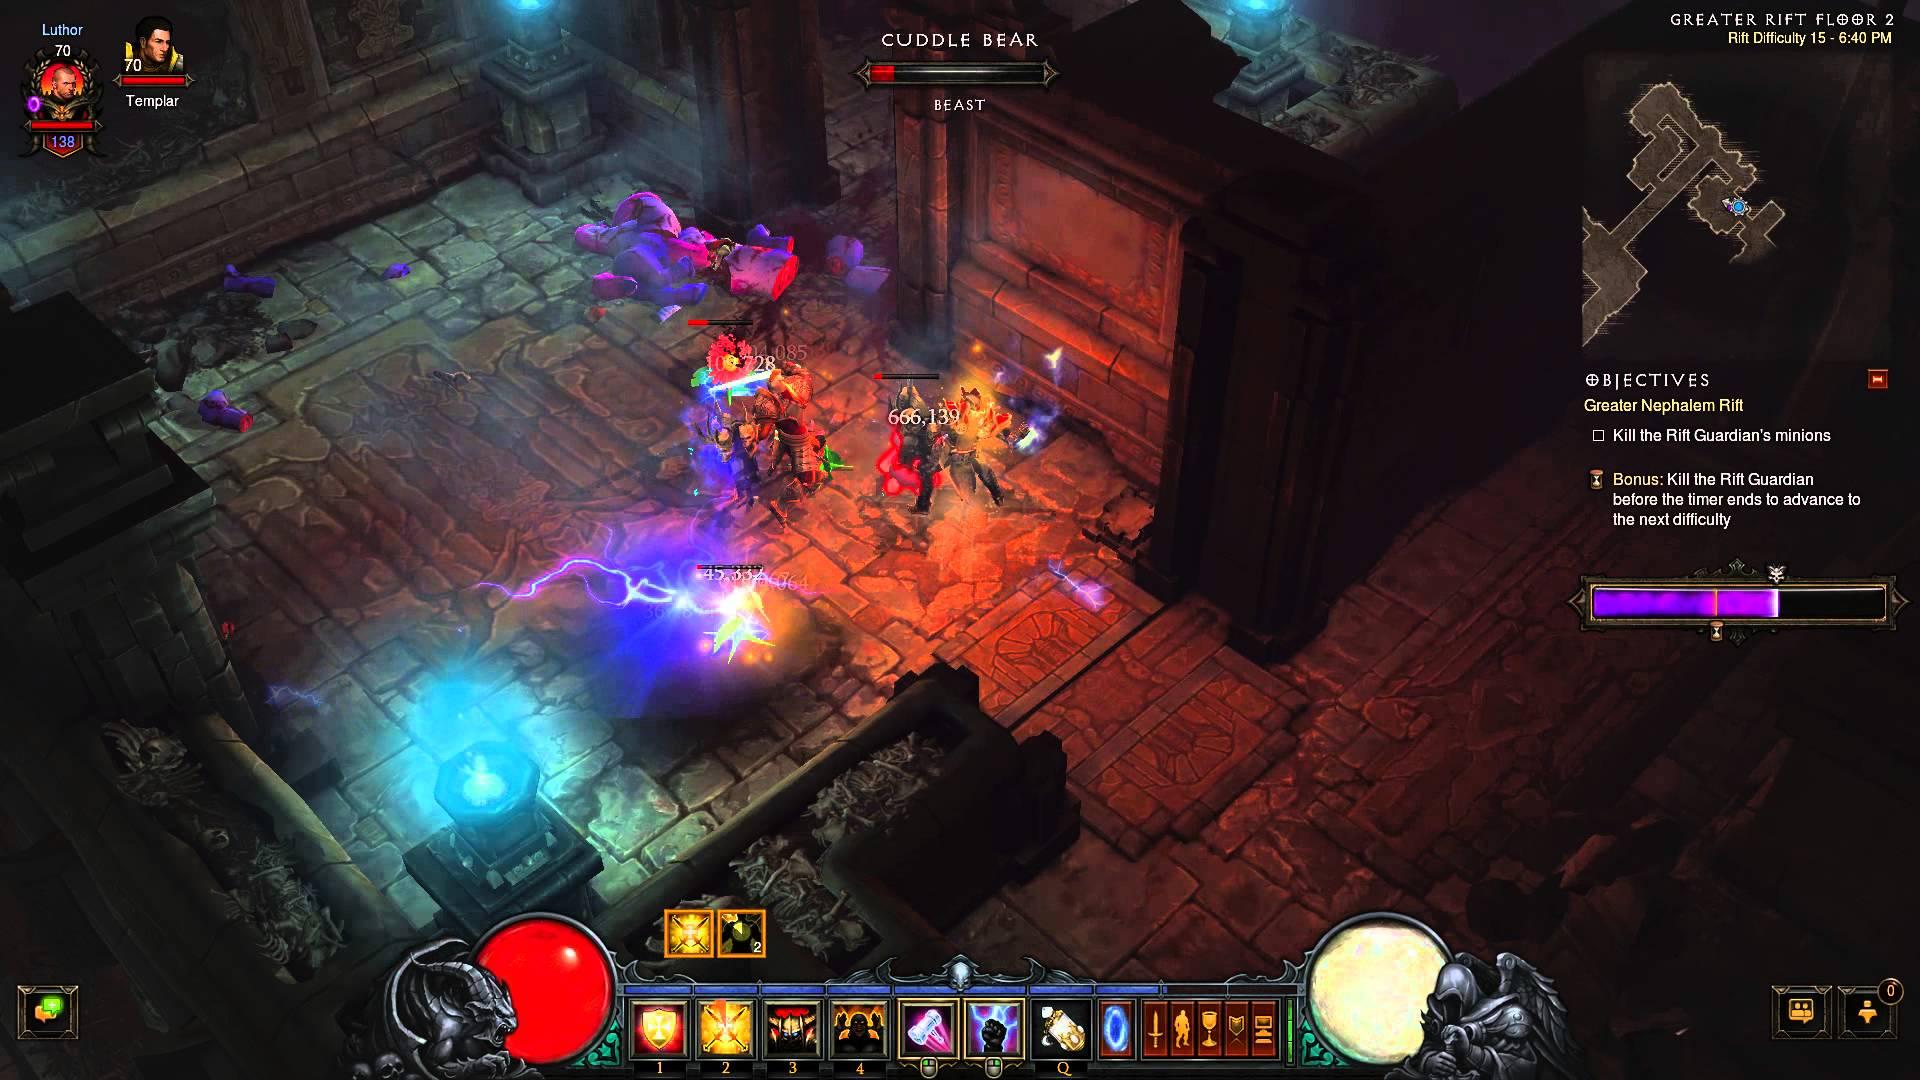 Diablo III – Greater Rift – Whimsyshire Enemies